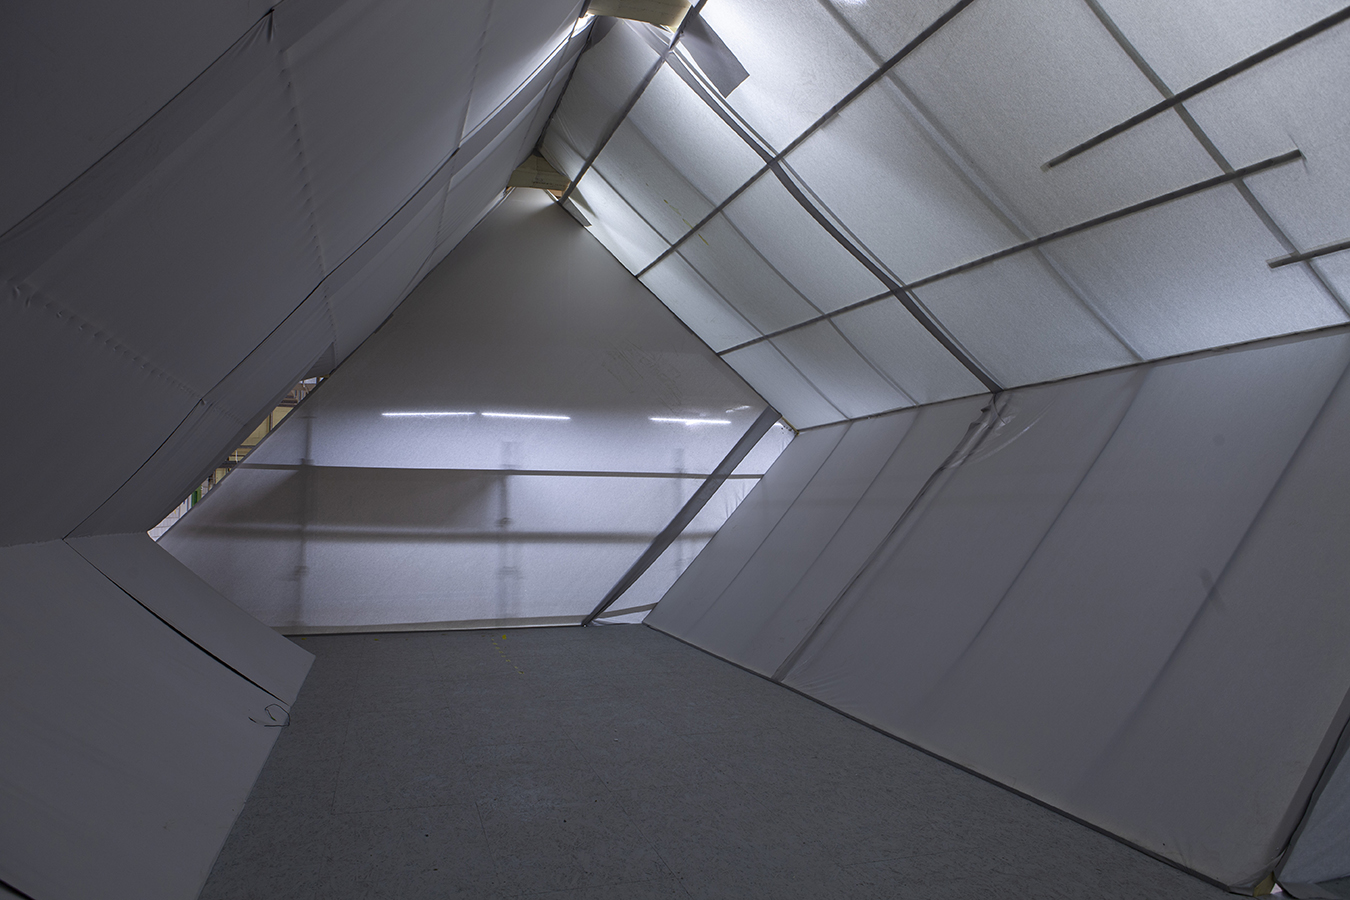 Gletschergarten Szenografie Felsgang Modell Prototyp Viscosistadt